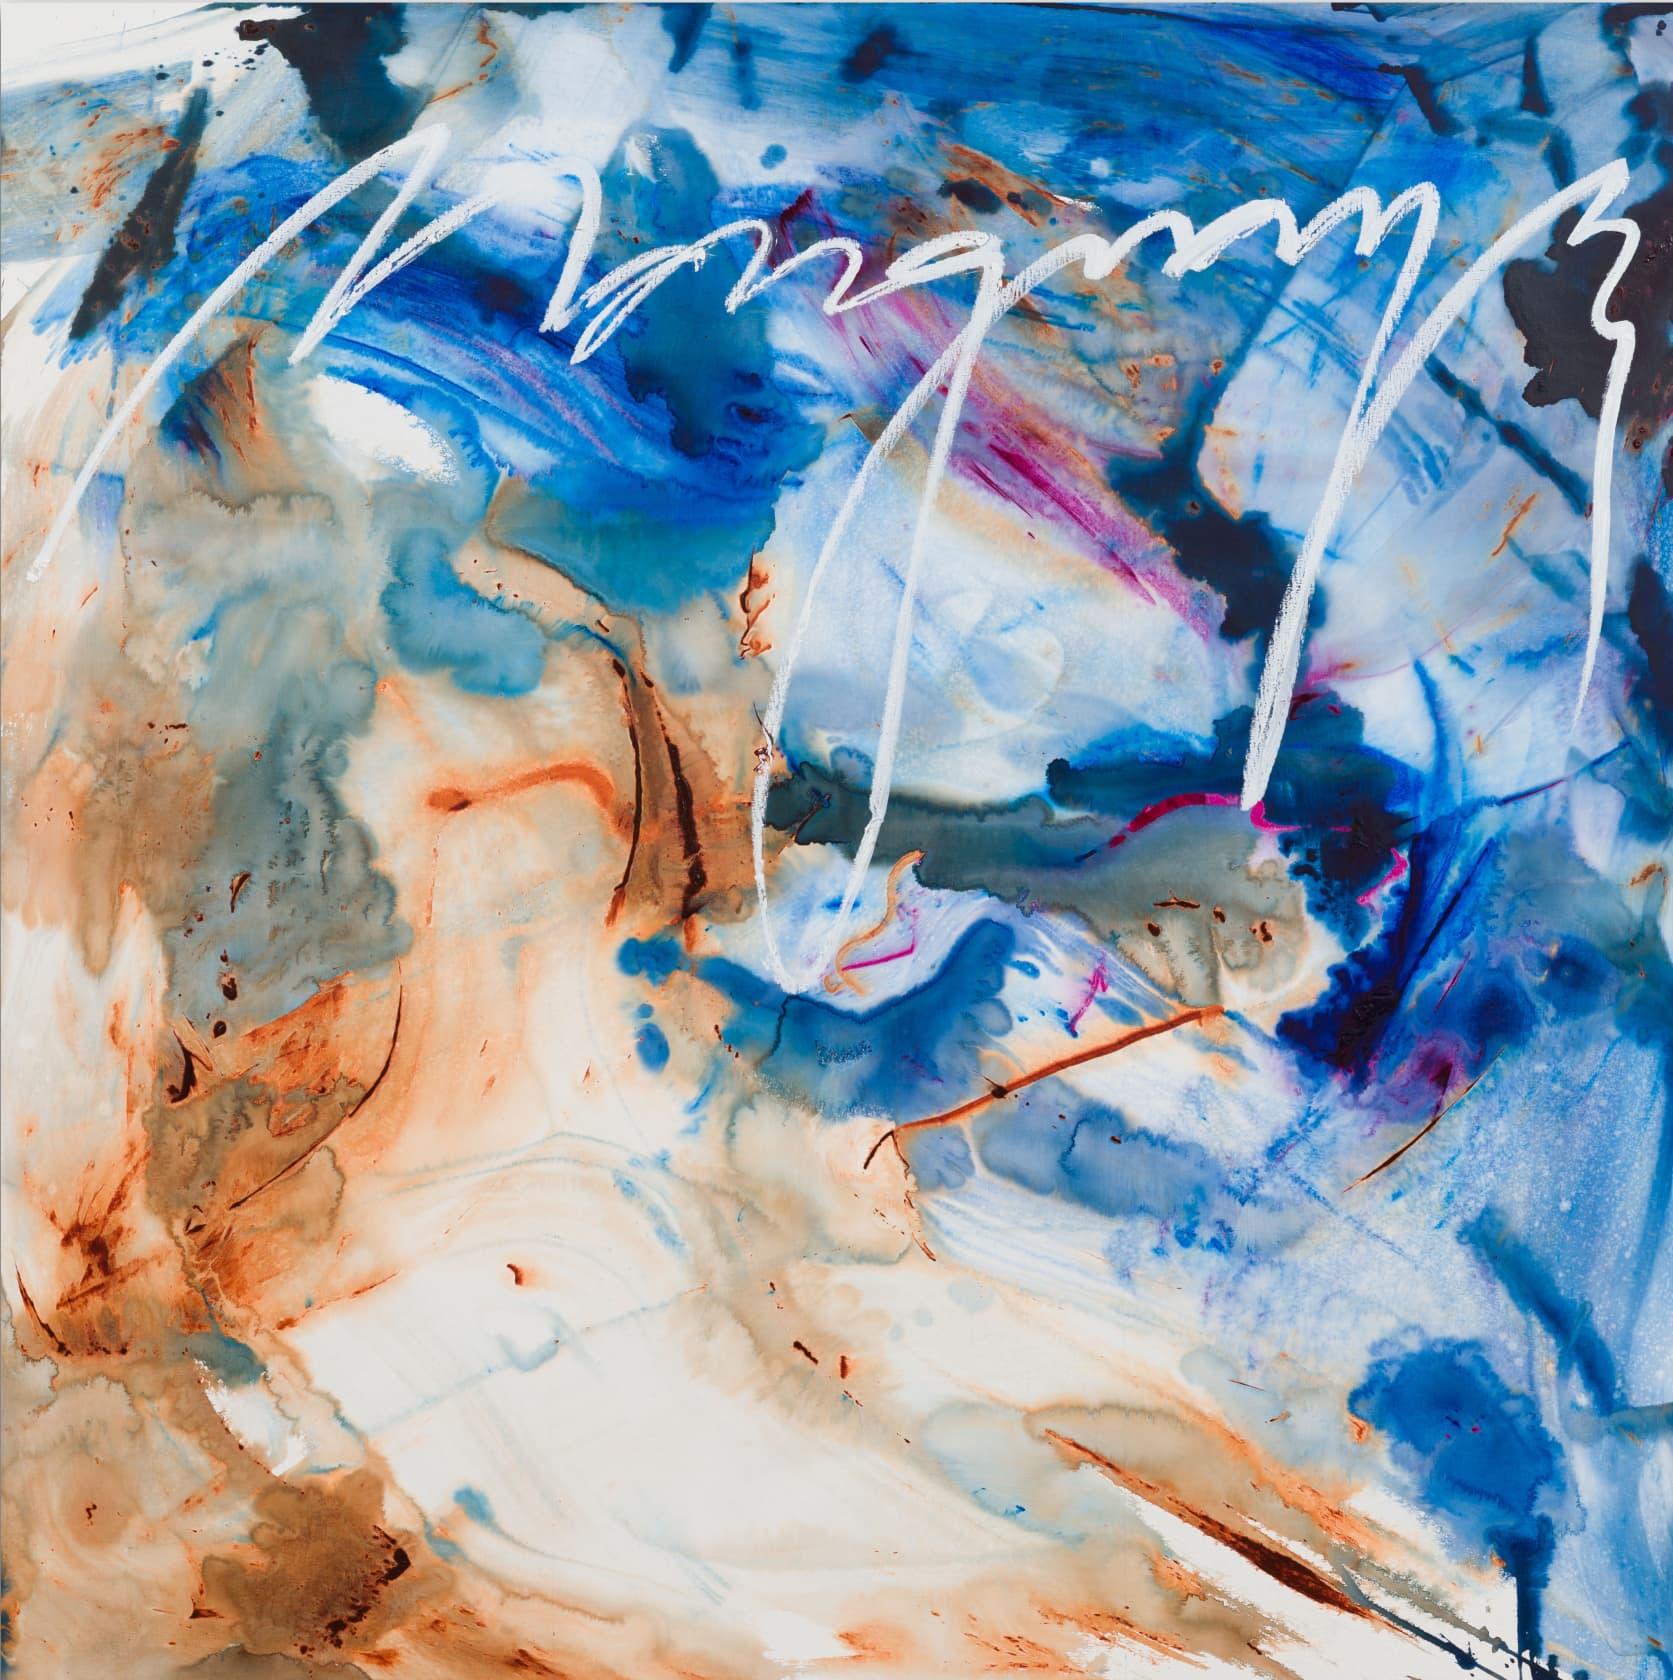 Retna Margraves Oil and Acrylic on Canvas